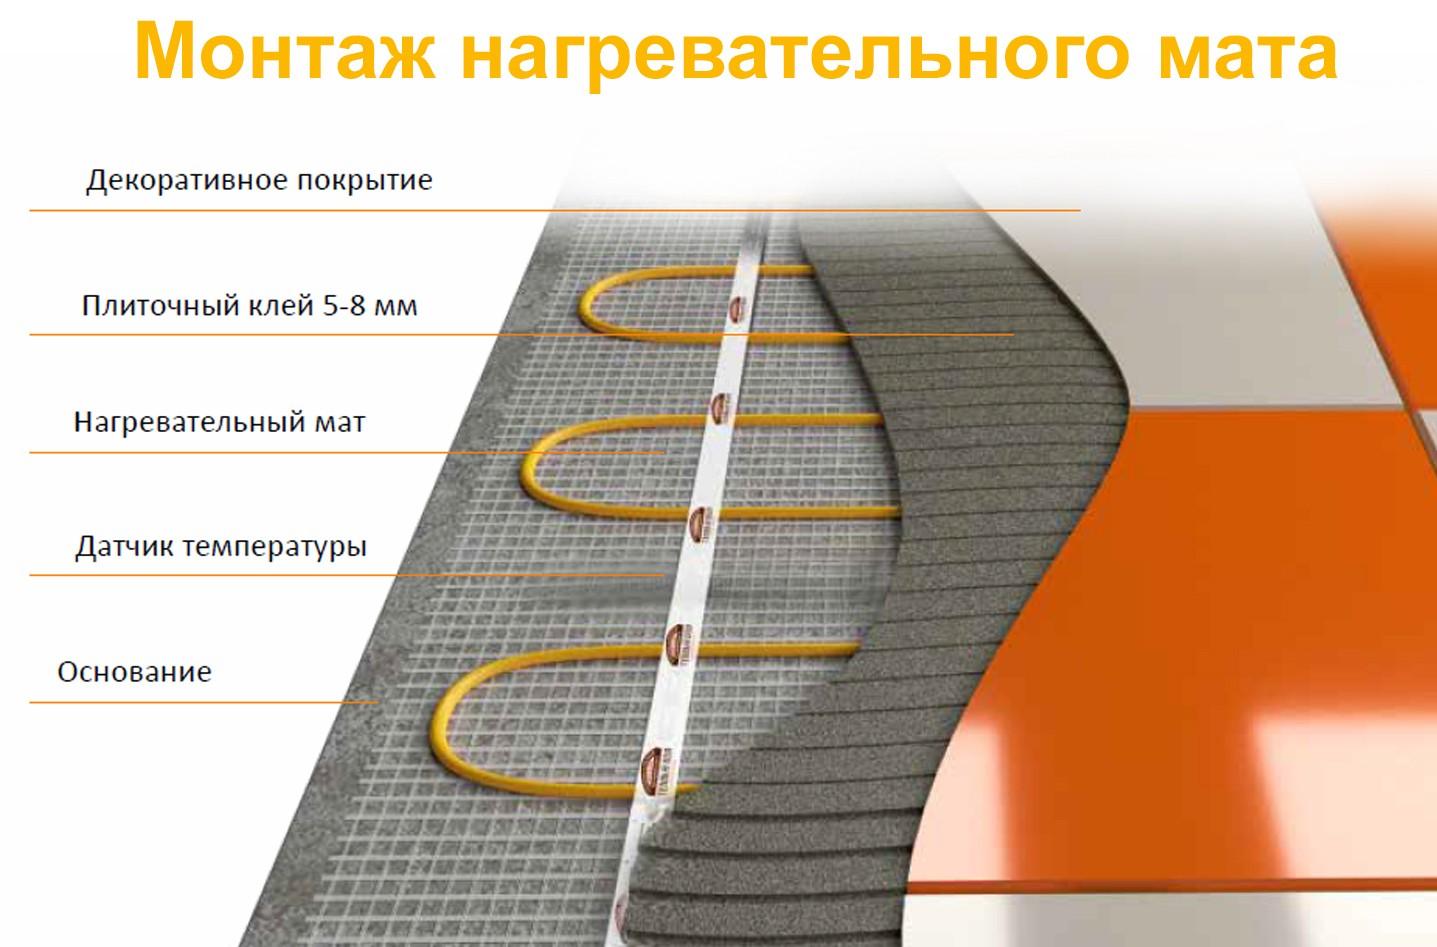 Правила монтажа теплого пола с электрическим проводом